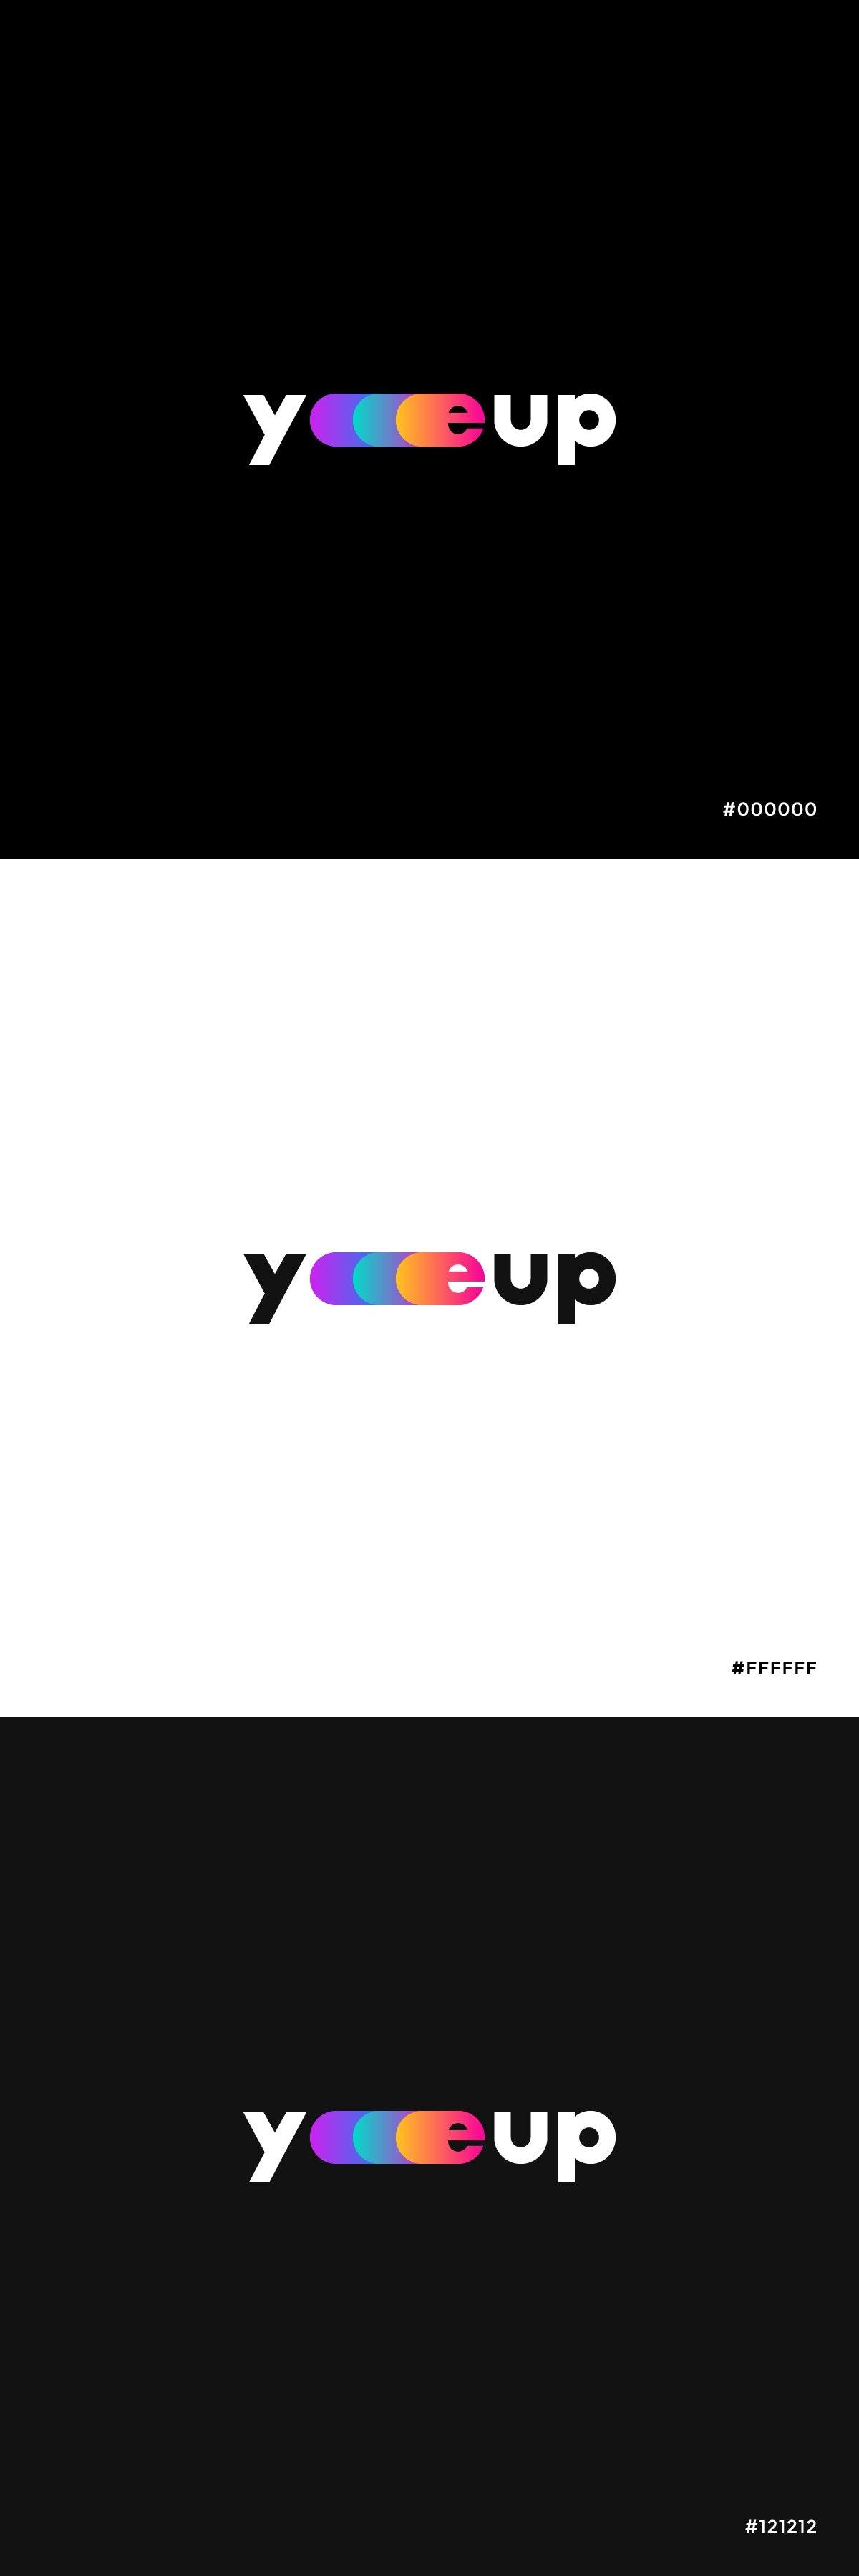 Clever logo design